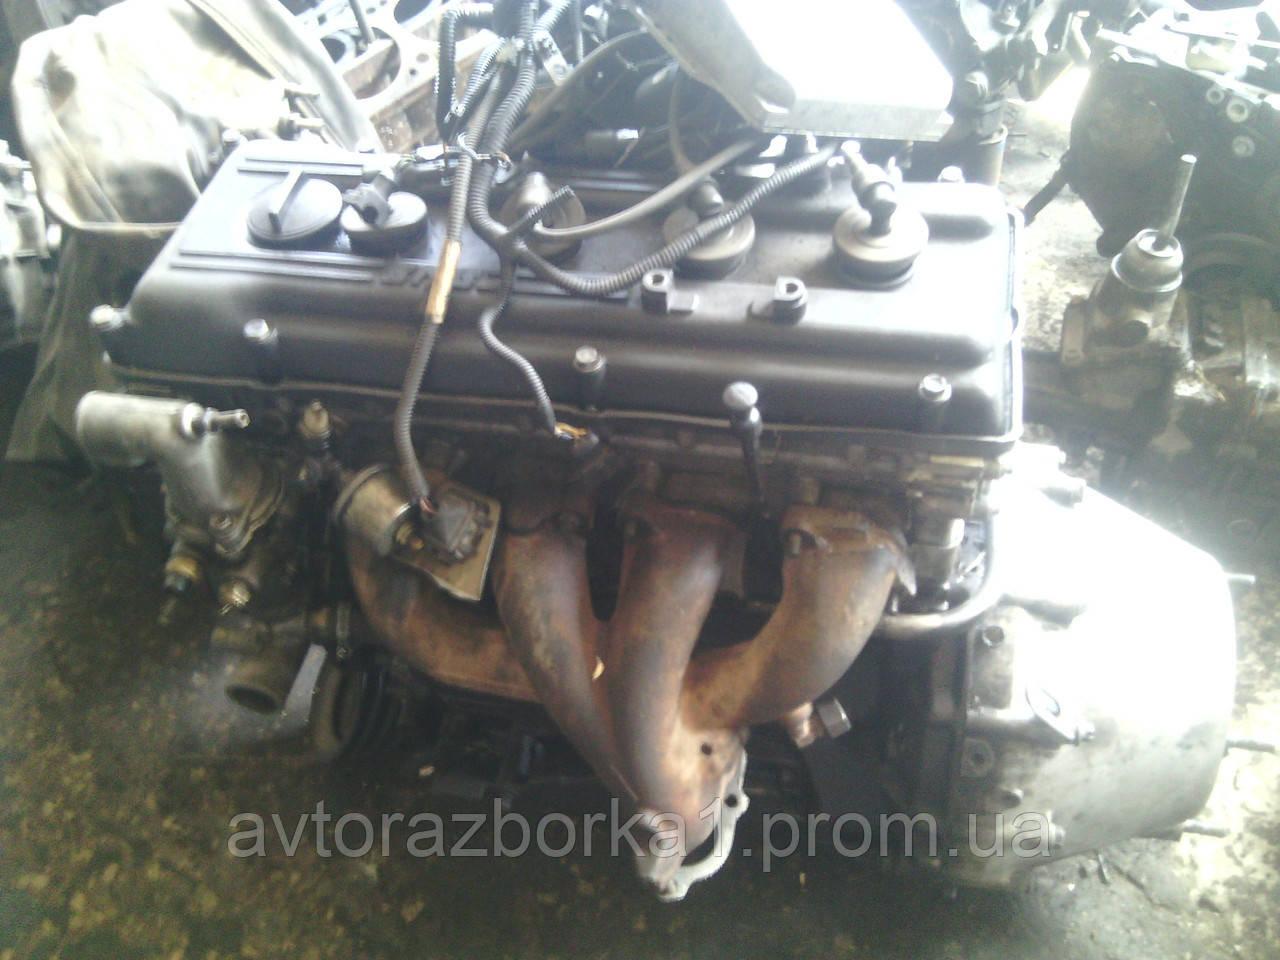 Двигатель Газель змз 406 б\у